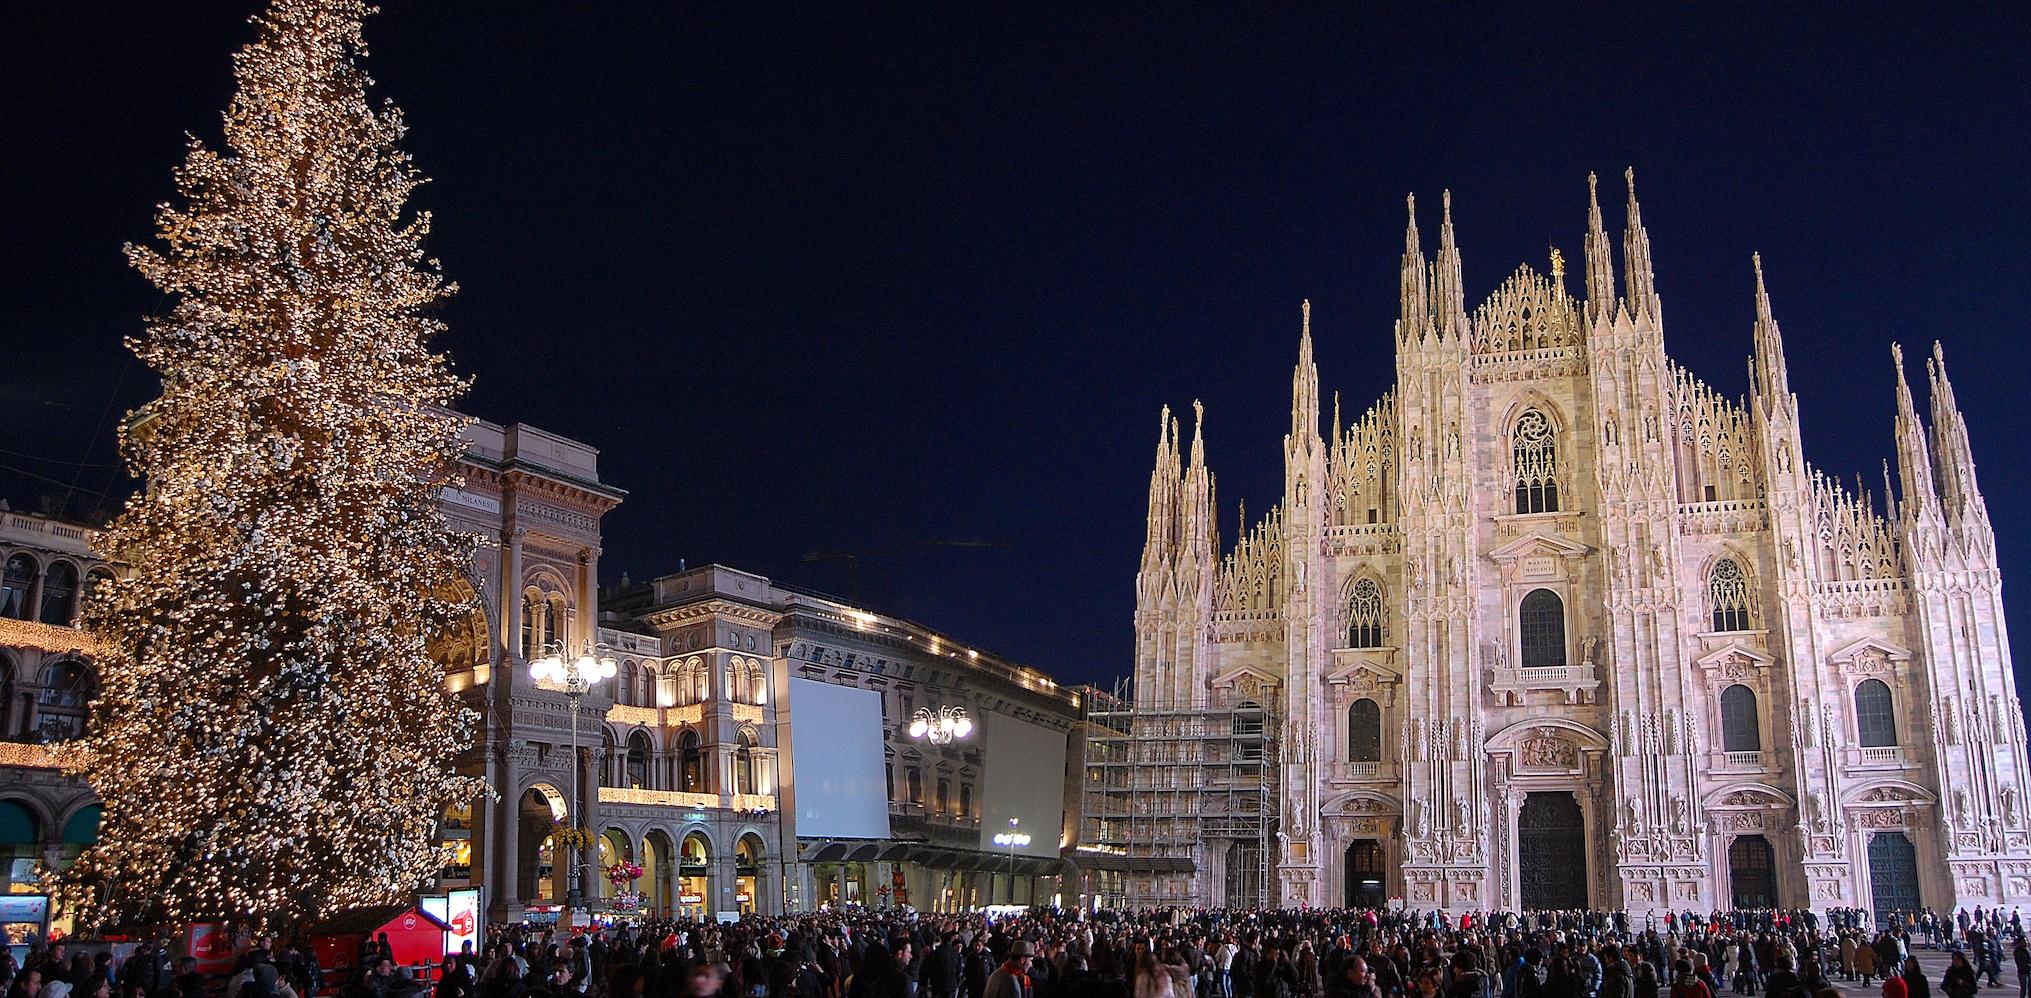 Milan's beautiful Duomo during the holidays